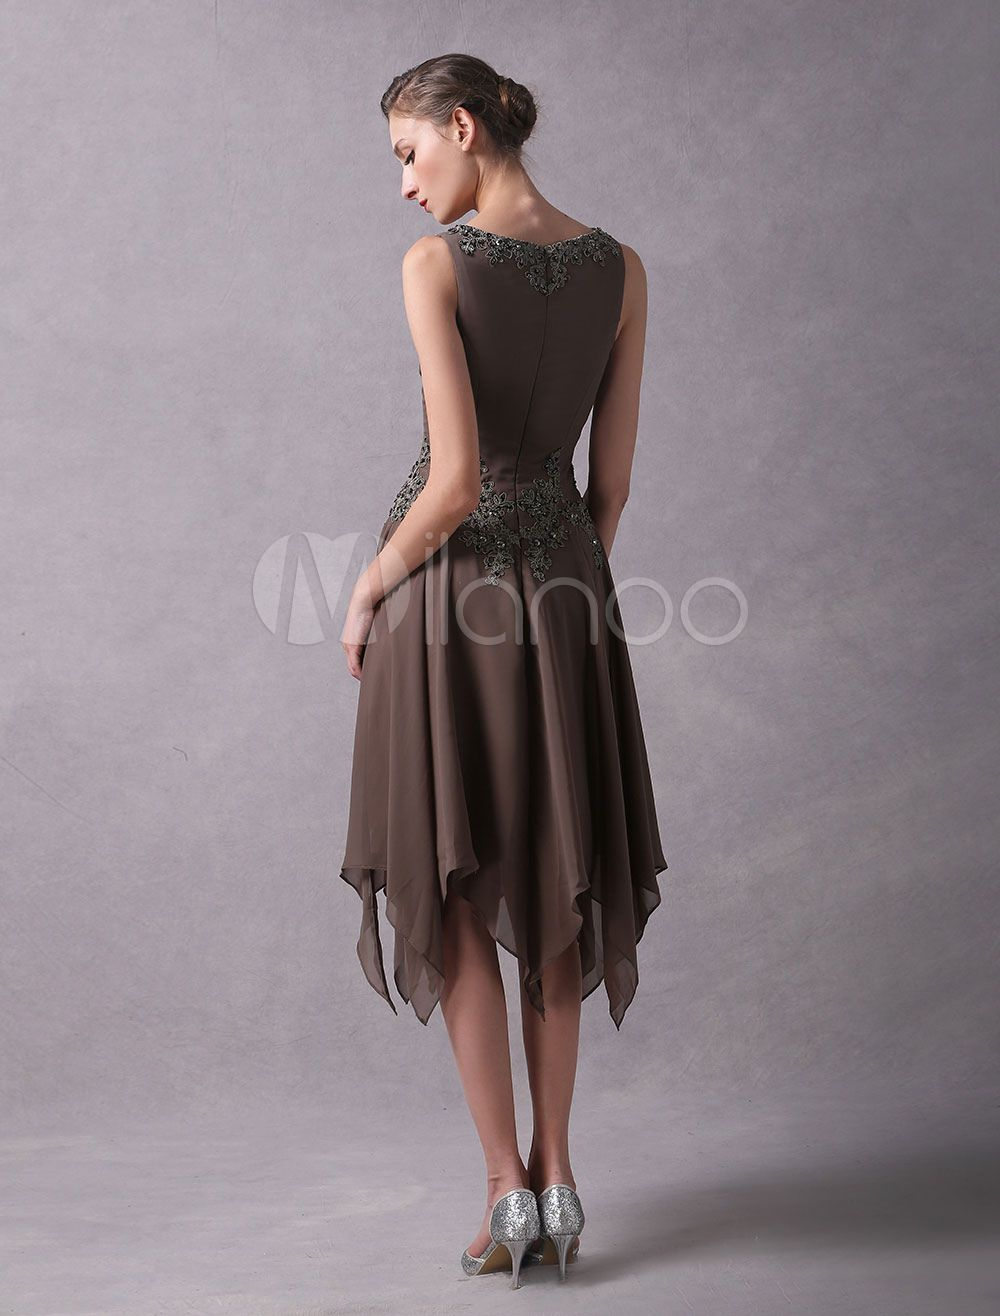 05f4a07dc38af Wedding Guest Dresses Lace Applique Chiffon Short Mother Dresses Beaded V  Neck Asymmetrical Wedding Party Dress With Jacket #Applique, #Chiffon, # Short